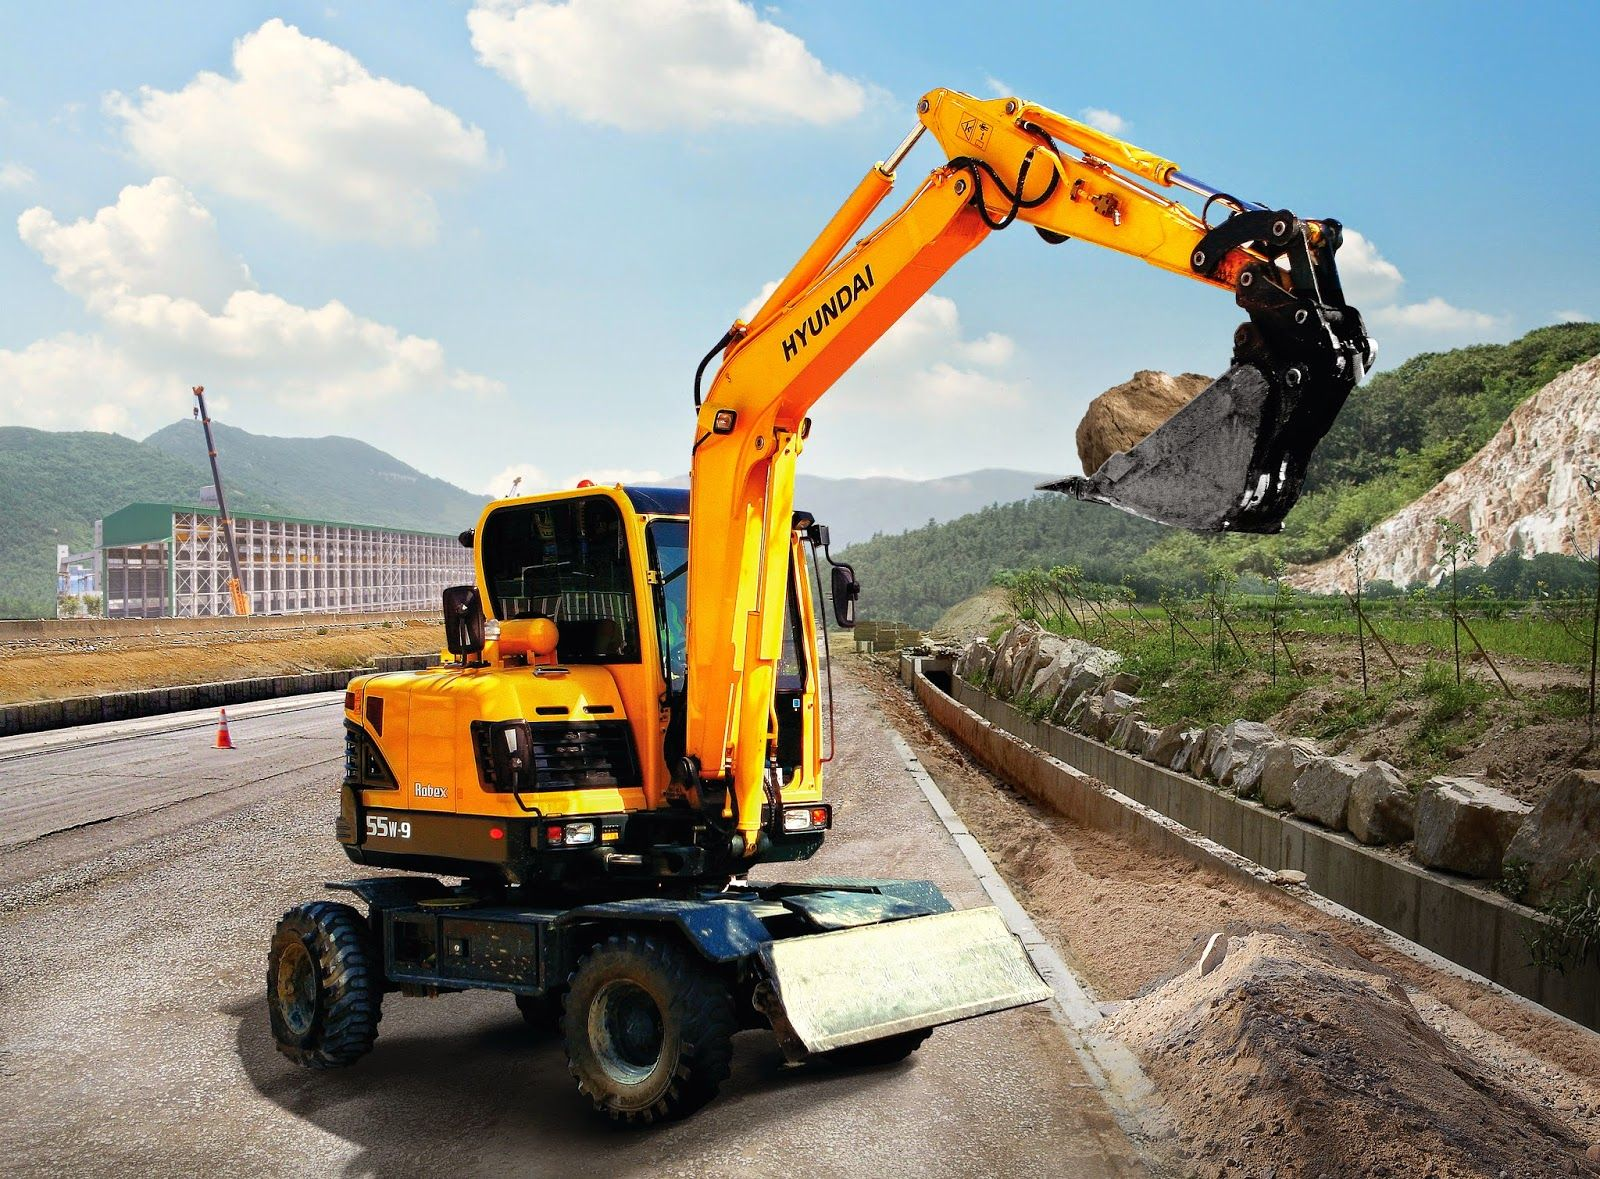 Hyundai Excavators R55W-9 - Alat Berat R55W-9 WHEELED EXCAVATOR The R55W-